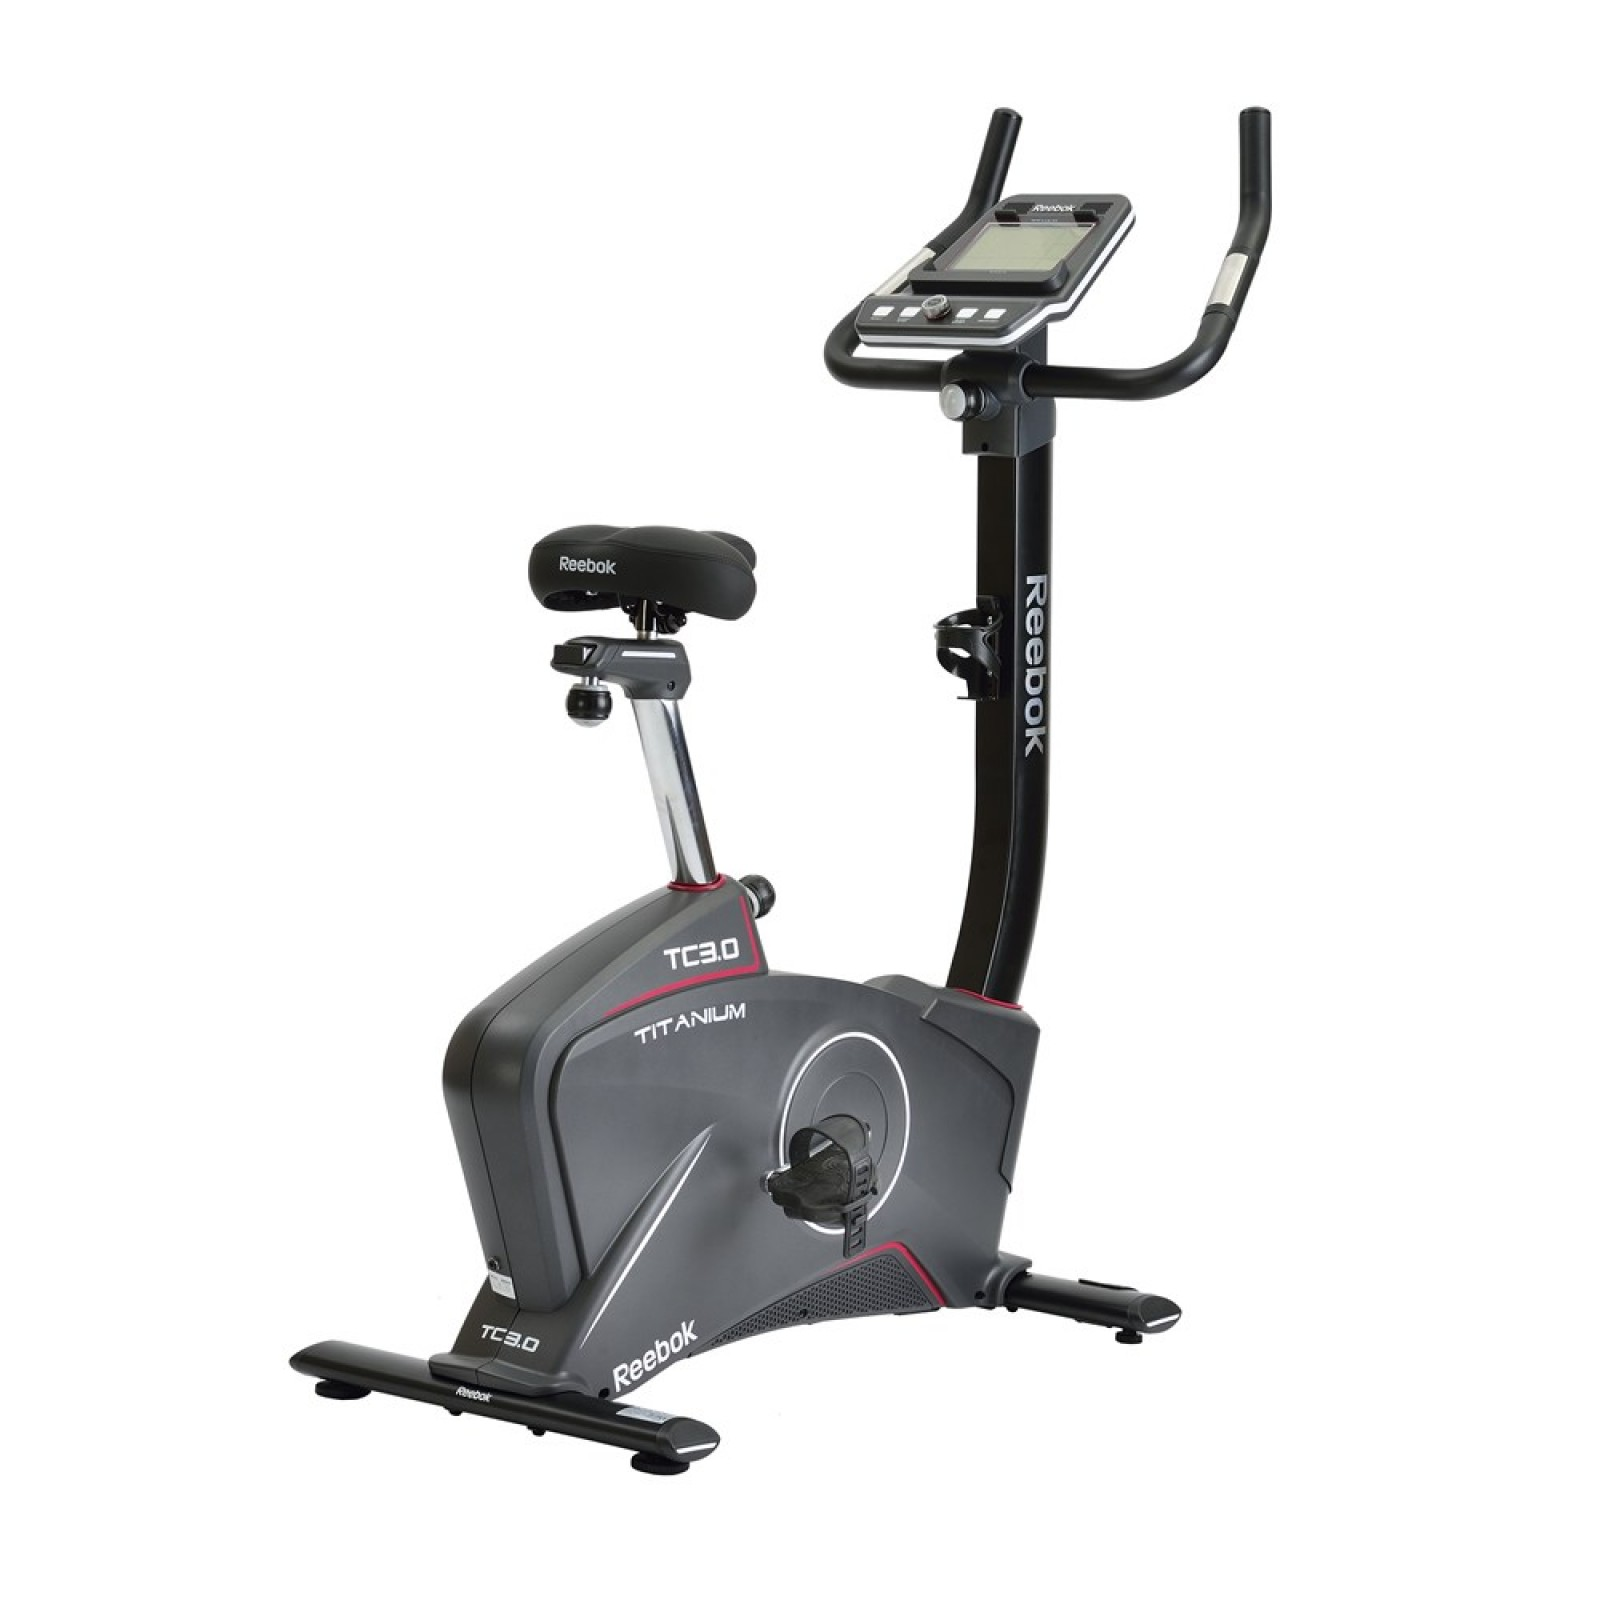 reebok exercise bike tc3 0 buy test t fitness. Black Bedroom Furniture Sets. Home Design Ideas